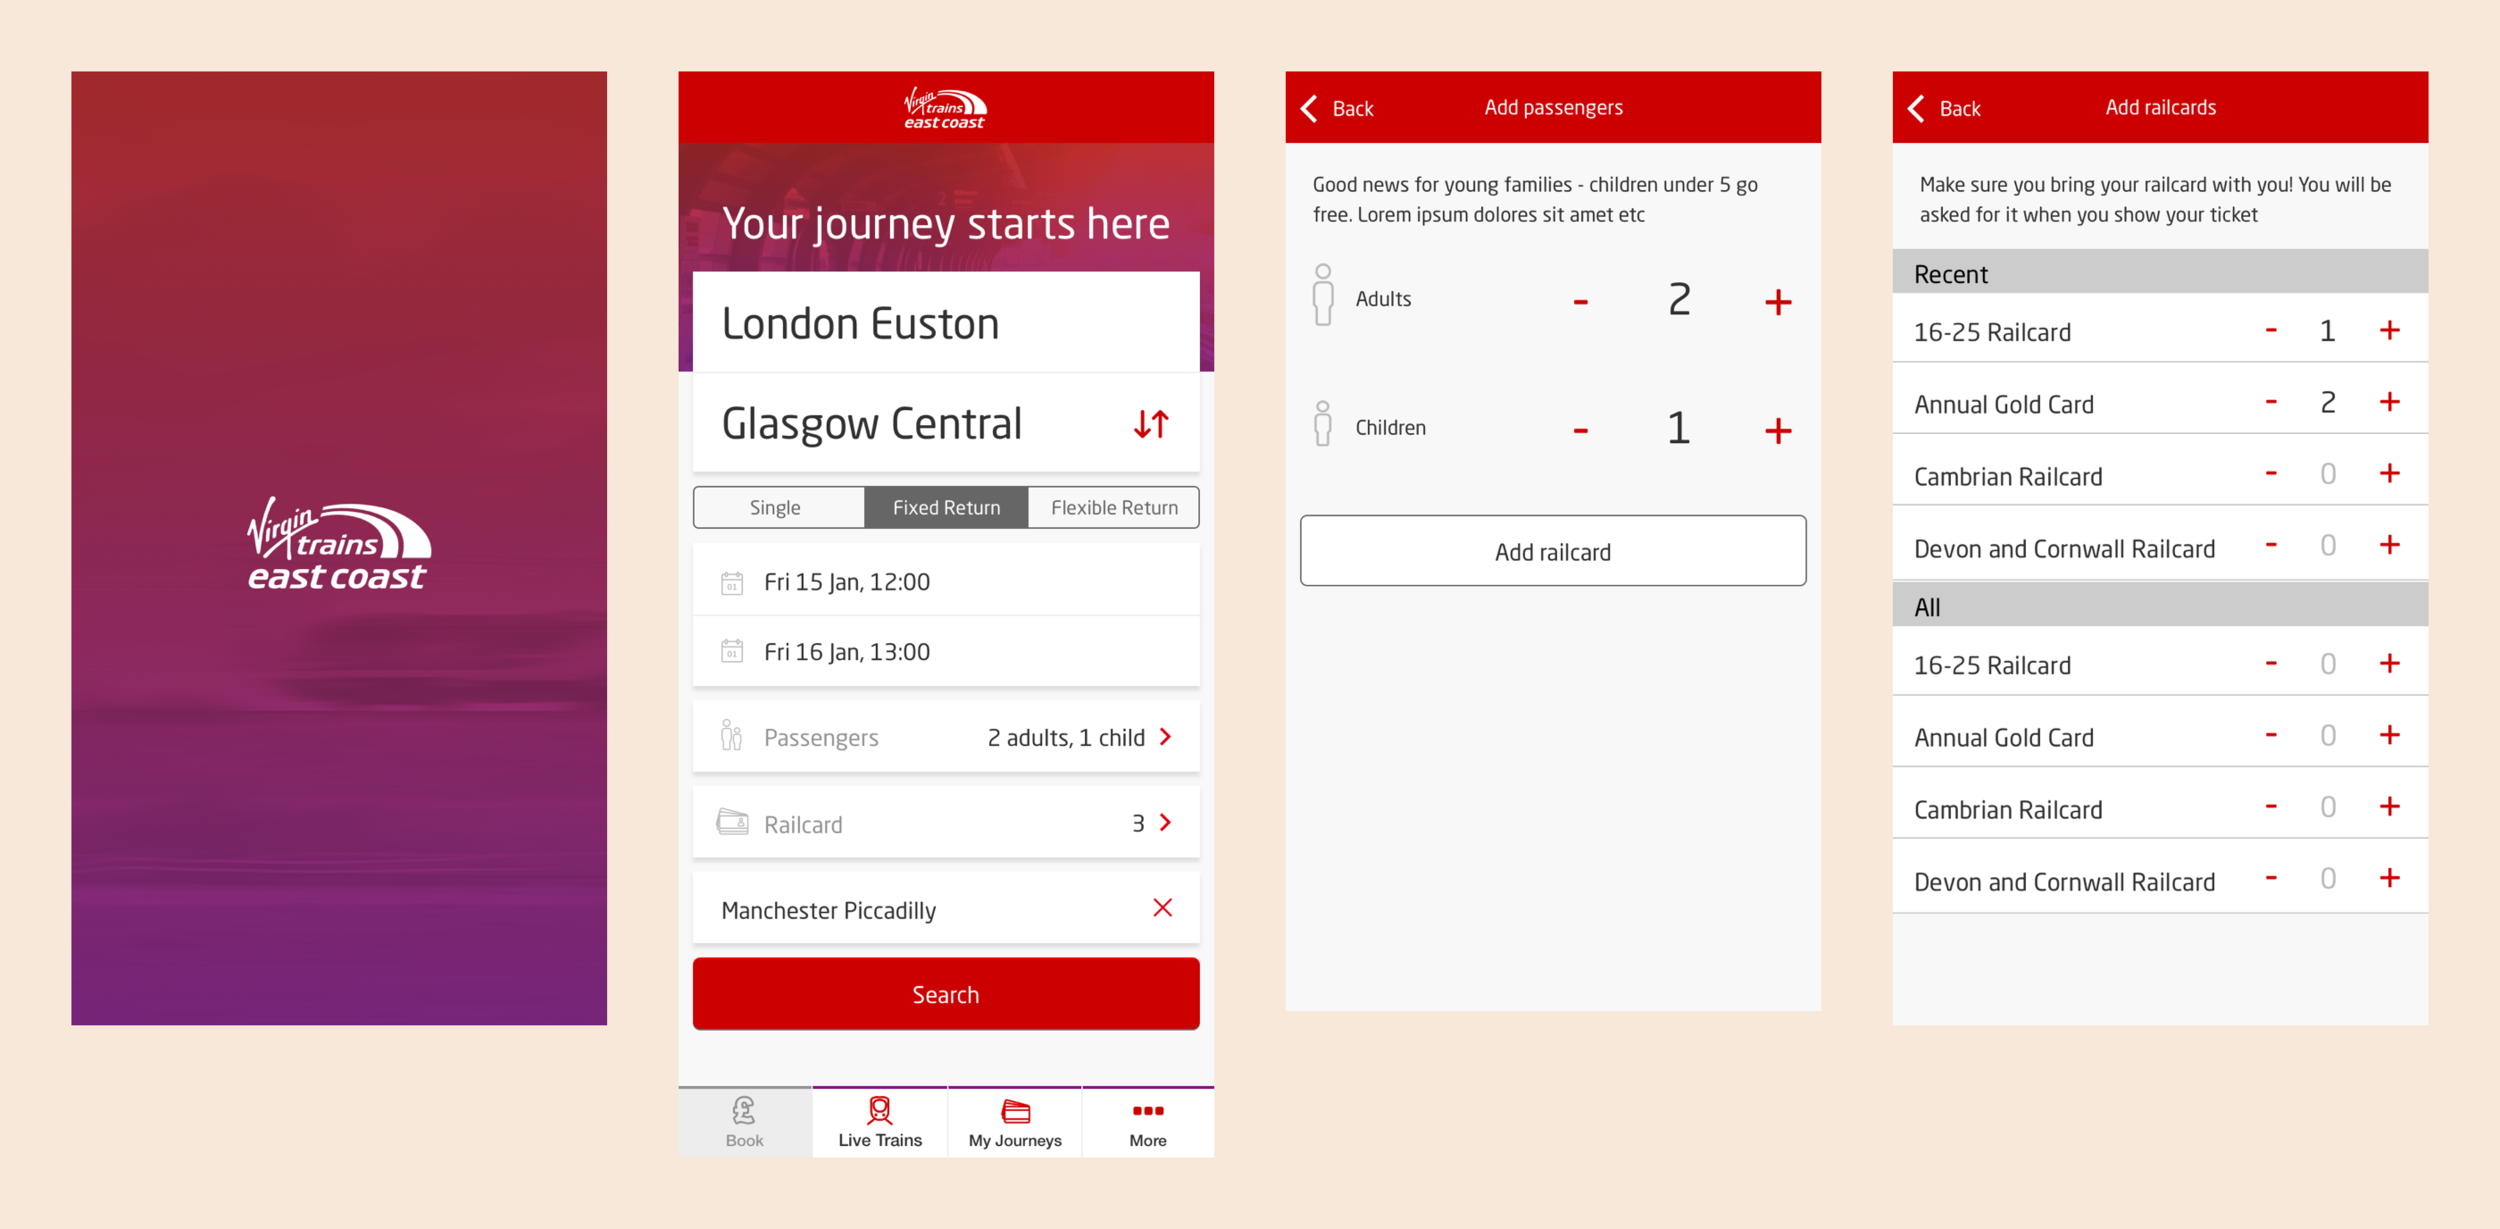 VirginTrains App design Screens 1.png